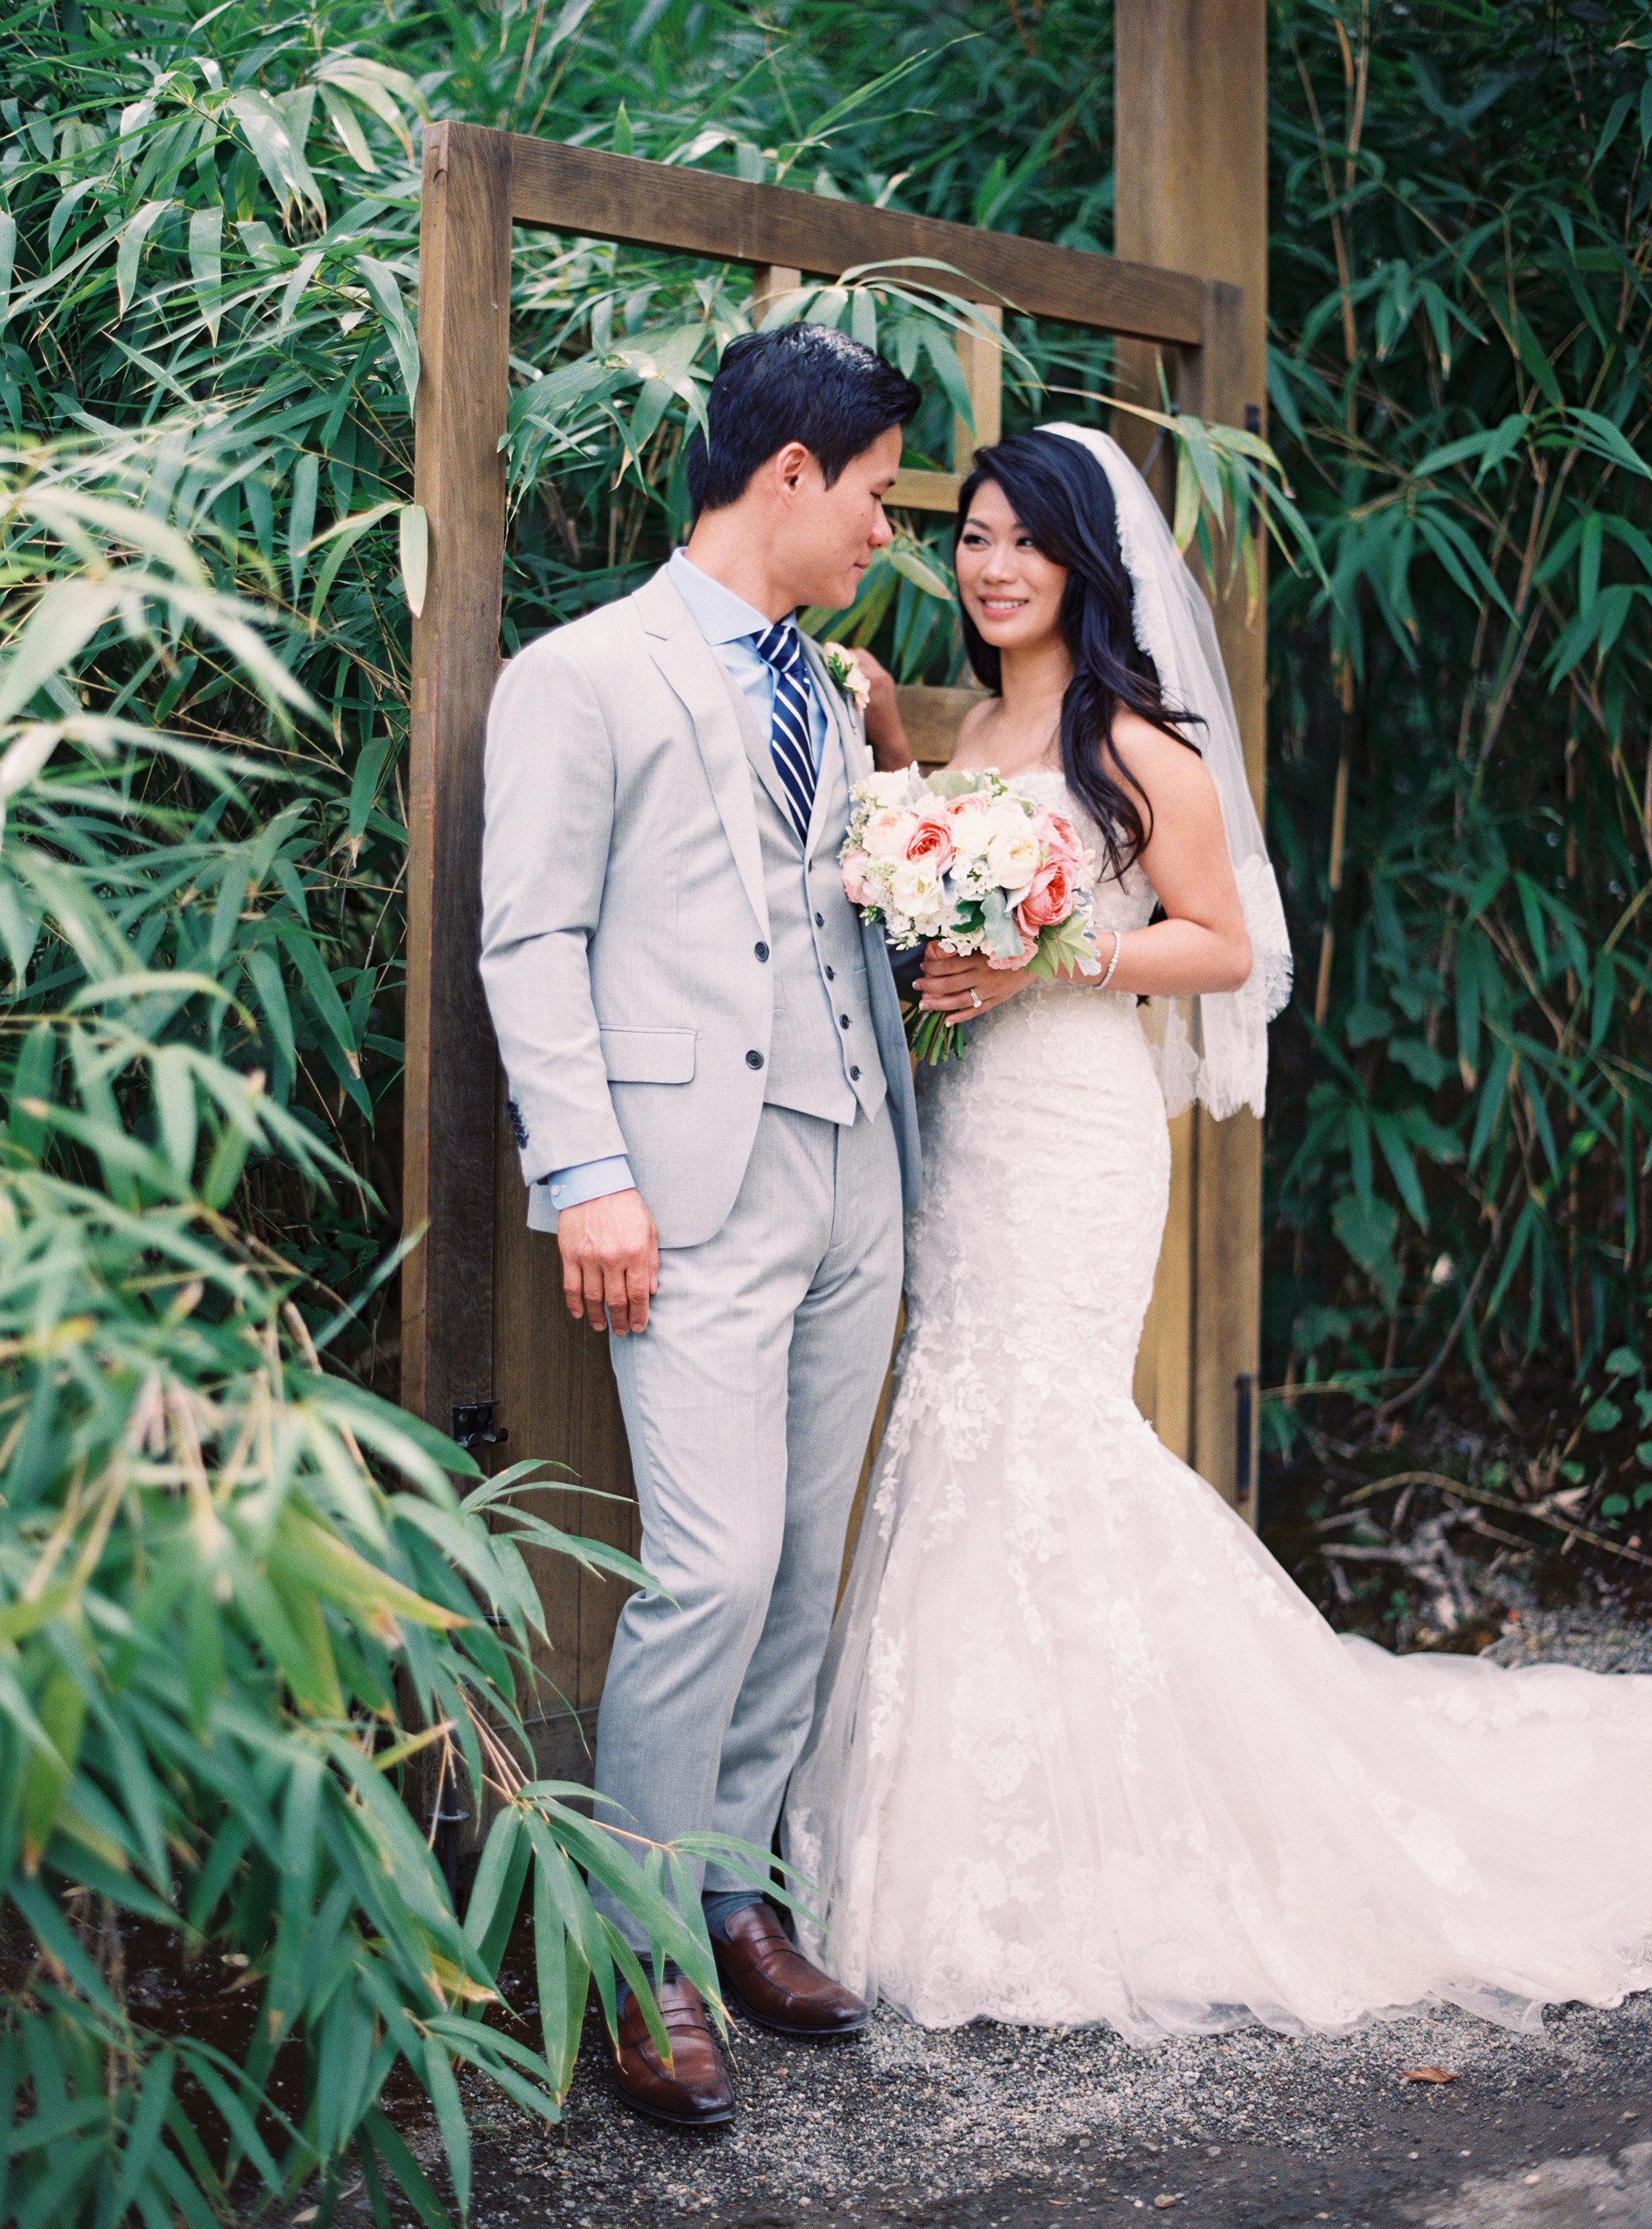 LindaTranPhotography-Flowerstory-Saratoga-wedding.jpg